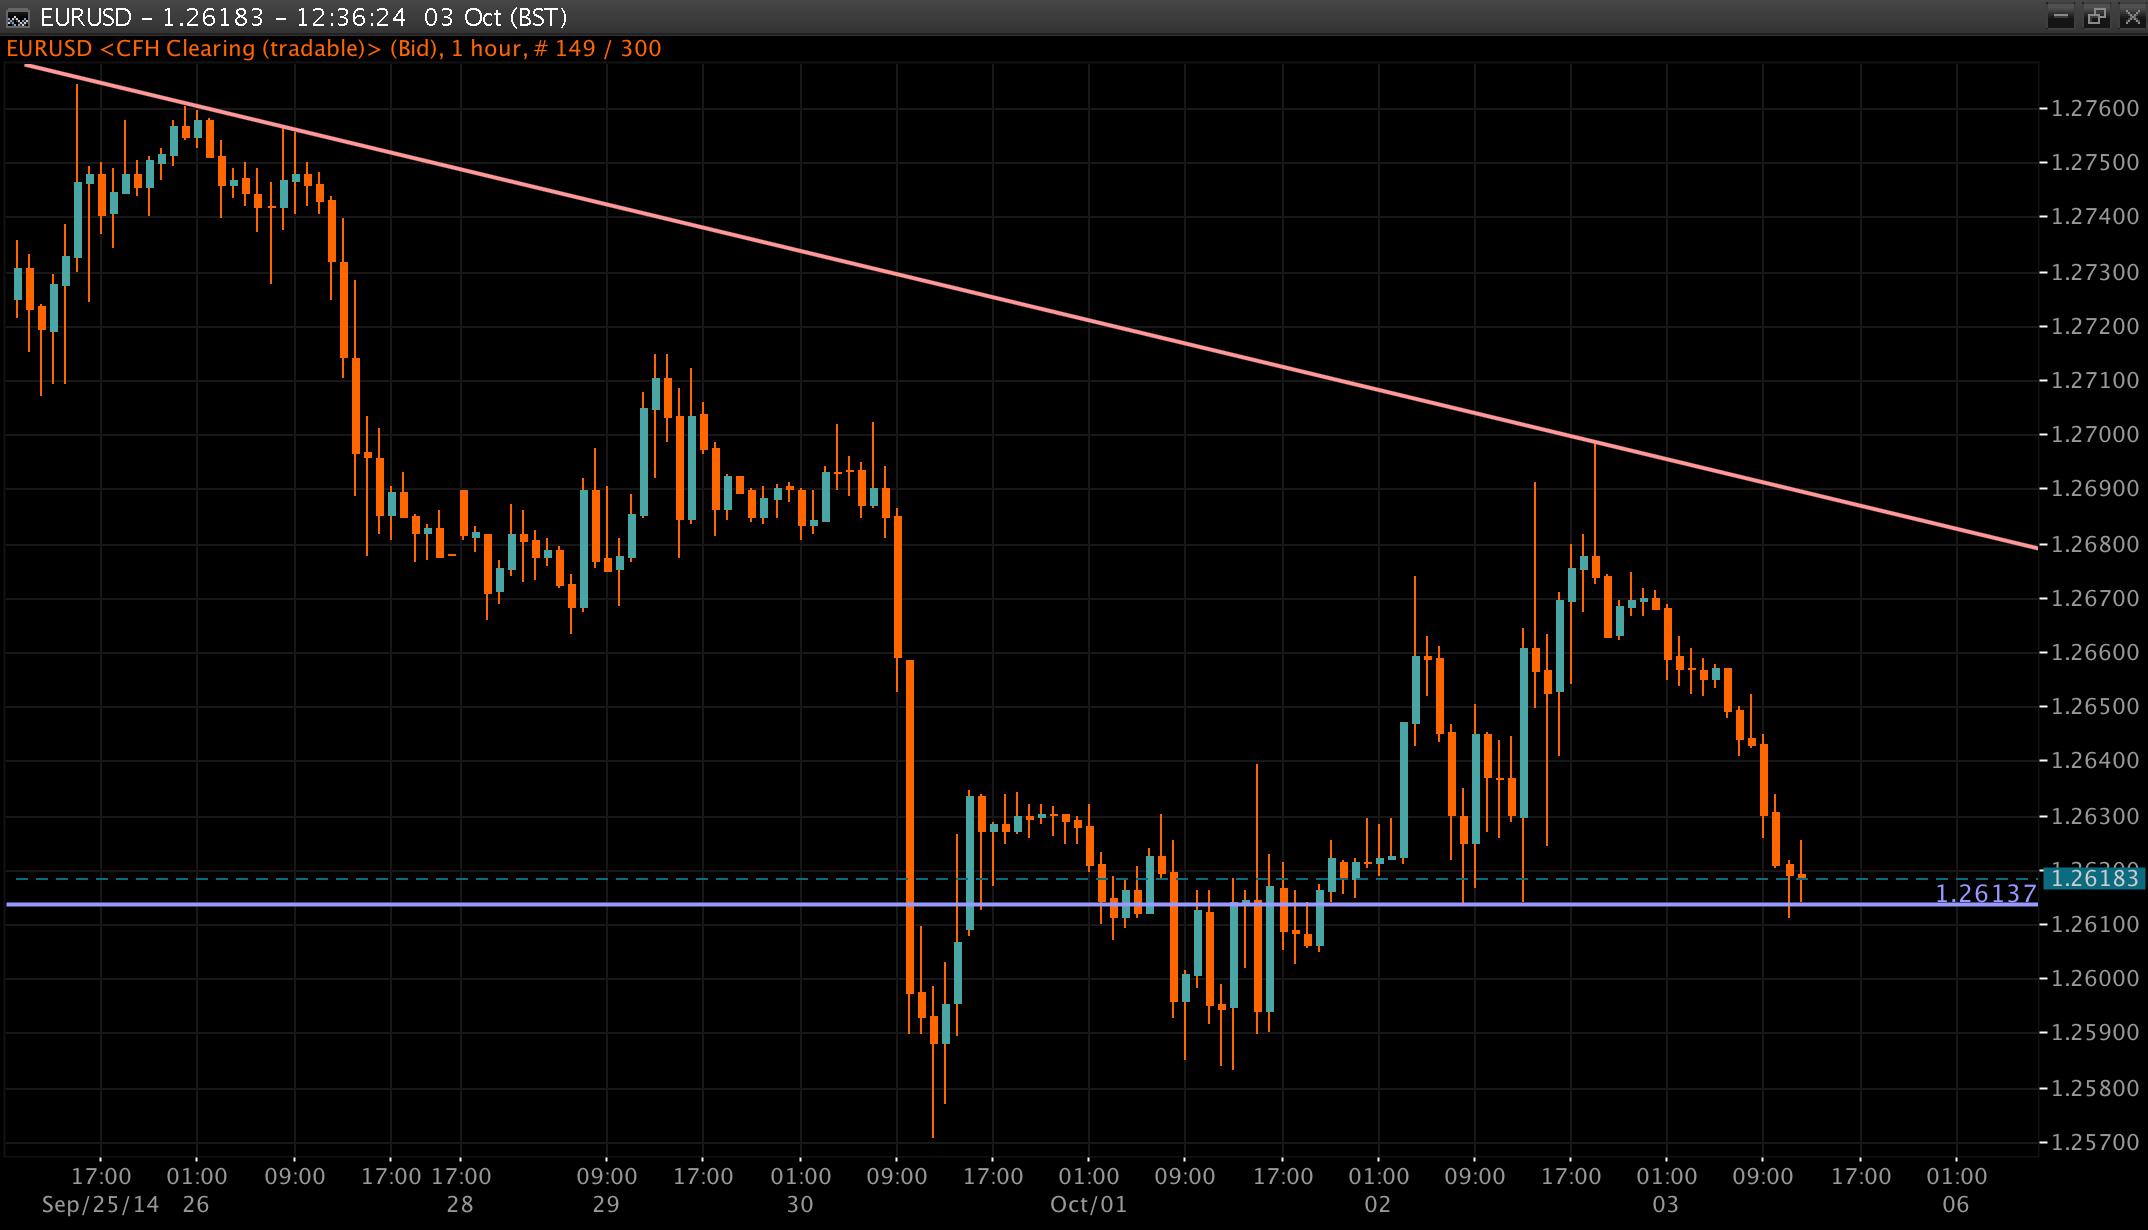 EUR/USD Chart 03 Oct 2014